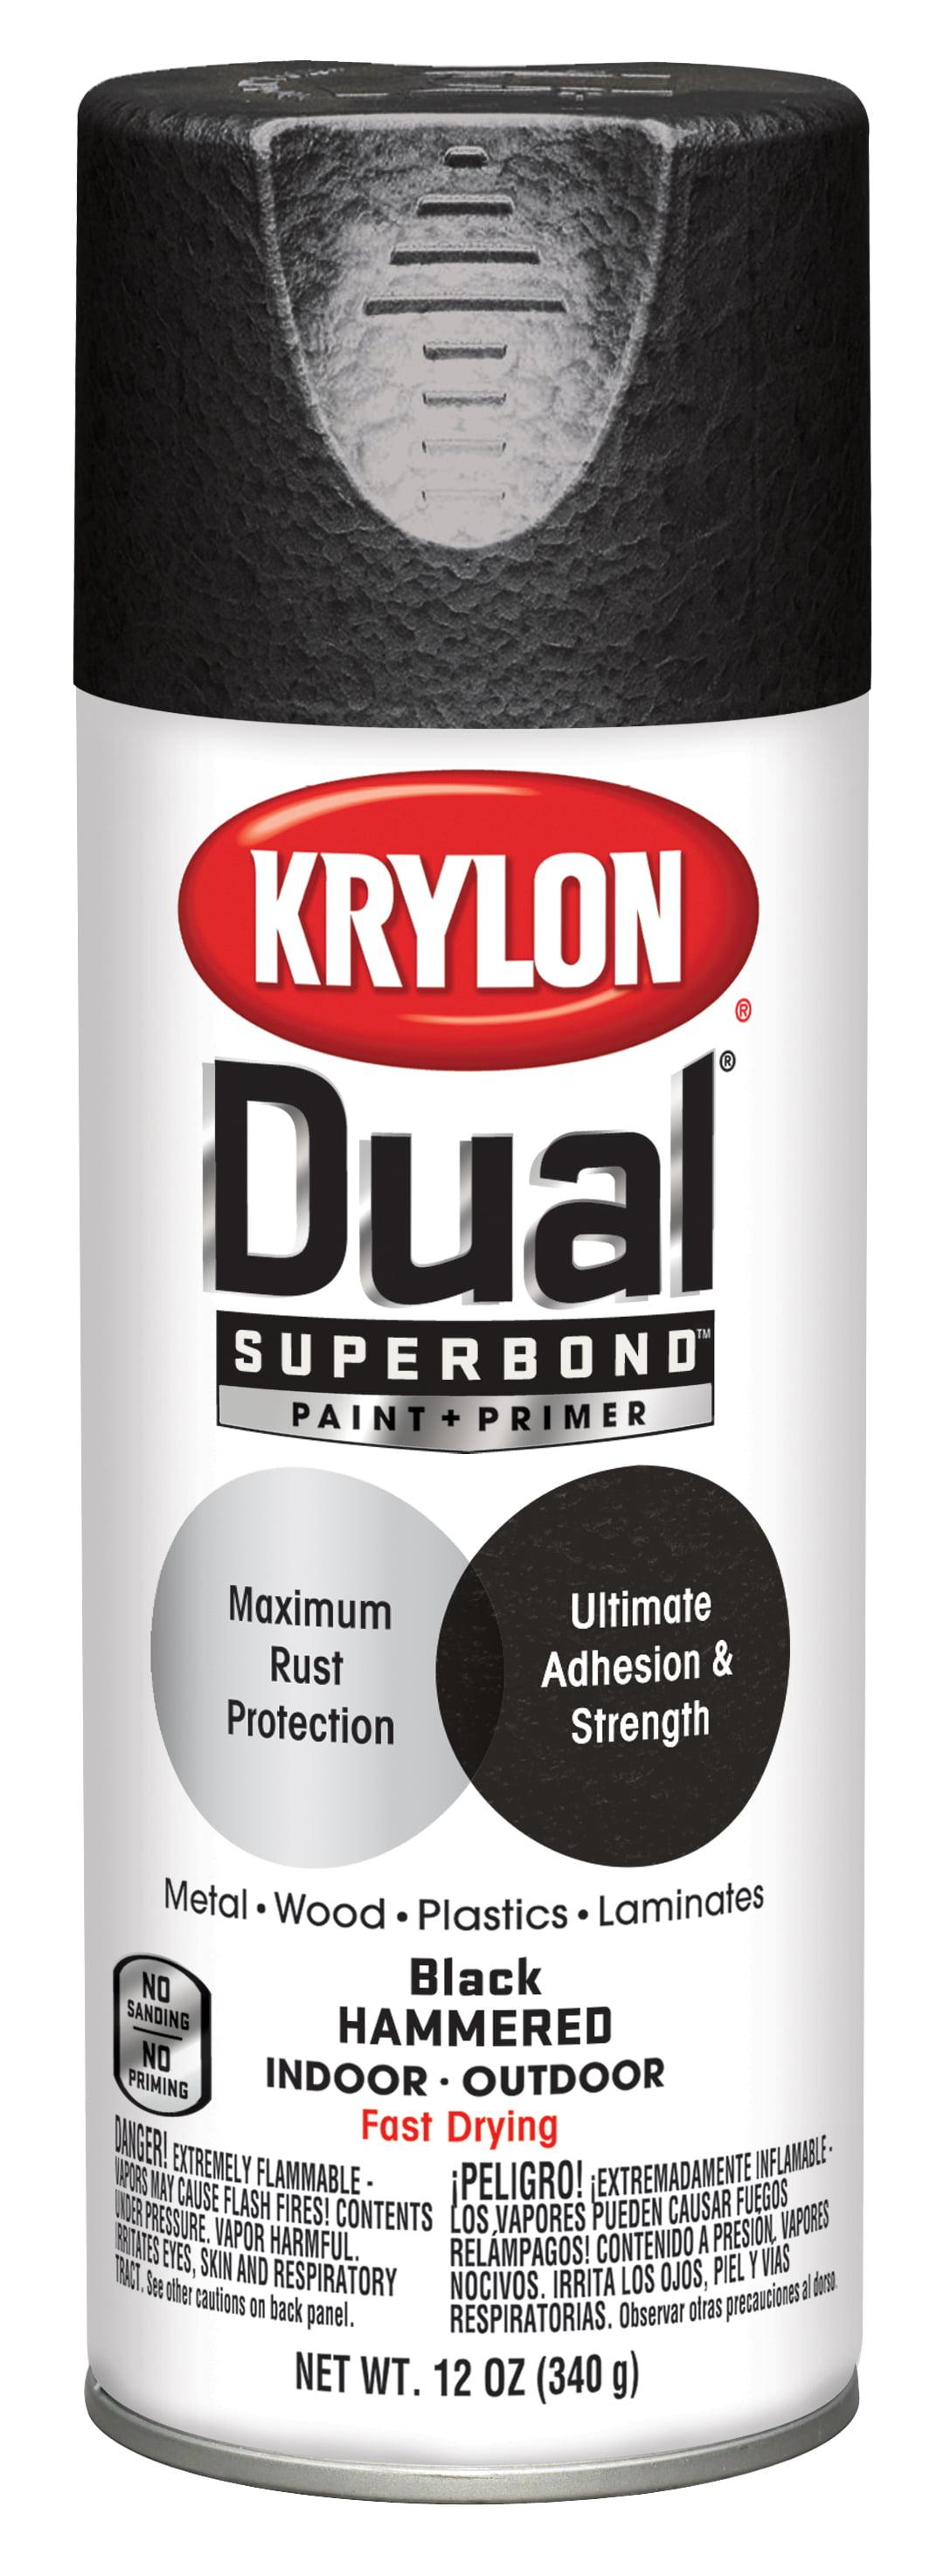 krylon dual superbond paint primer black hammered spray paint 12 Krylon Chalkboard krylon dual superbond paint primer black hammered spray paint